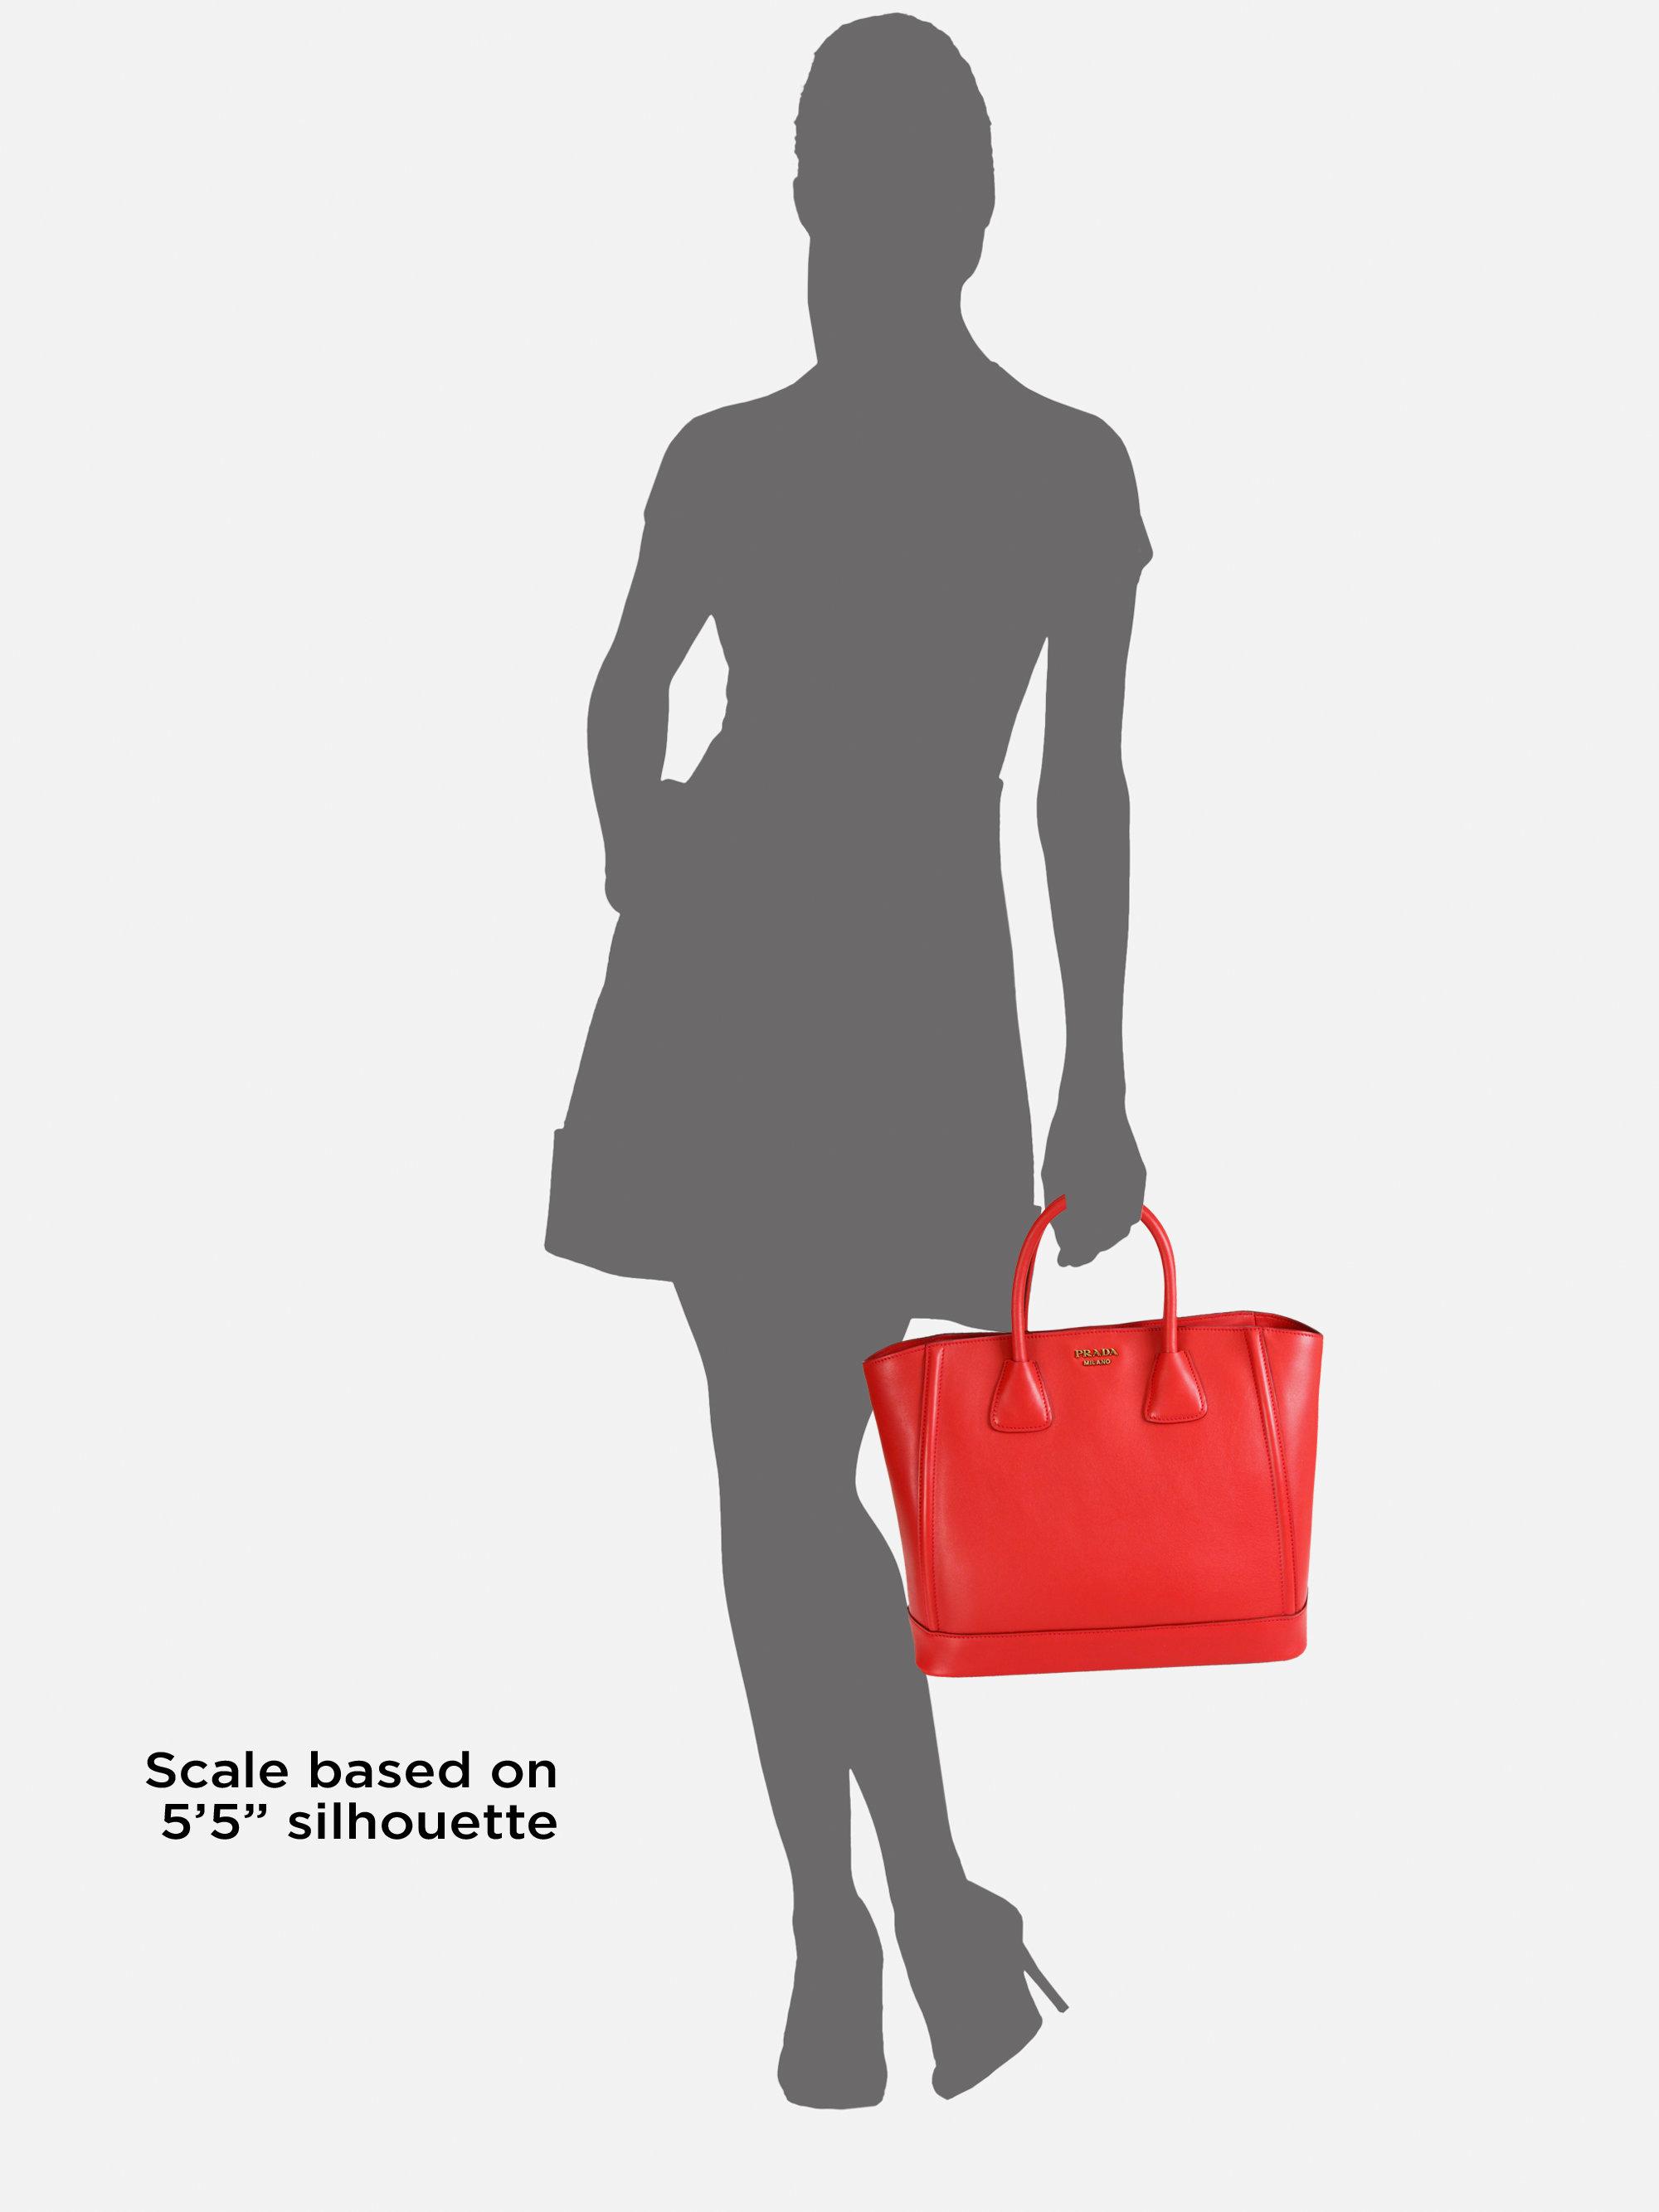 celine mini luggage price - prada city calf medium double-zip tote, red prada bag price